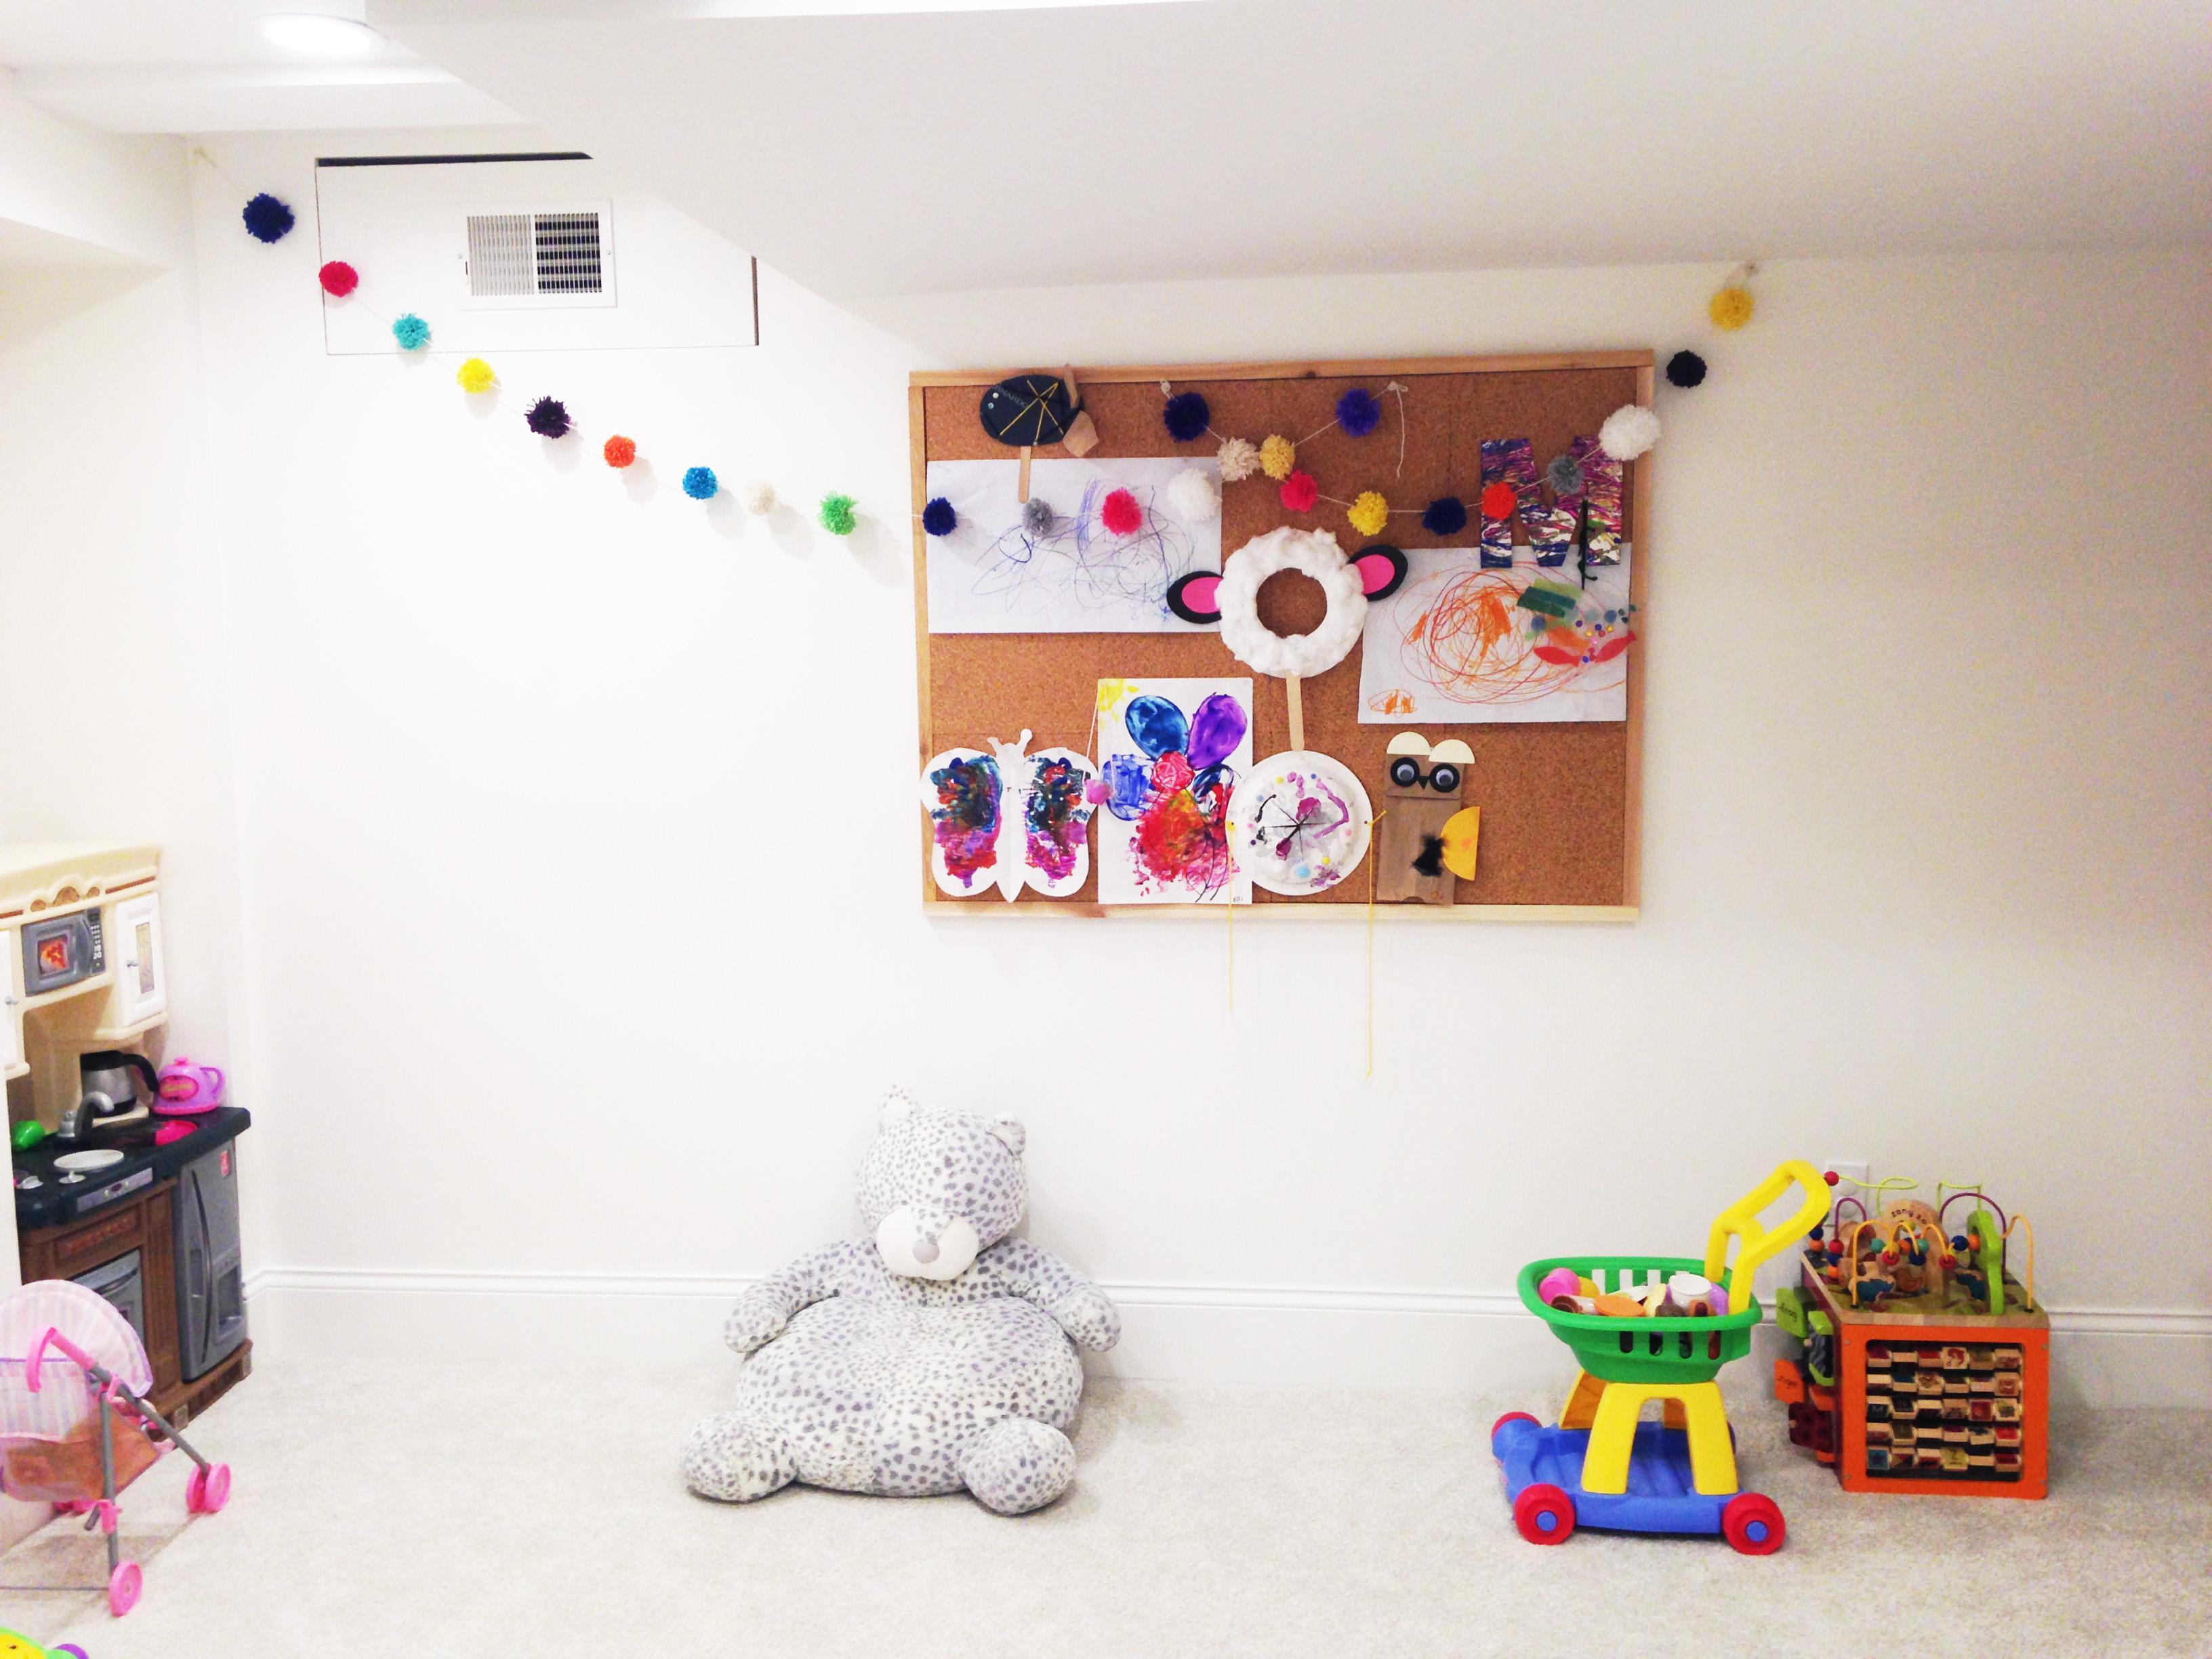 Making a giant cork board for kid's artwork